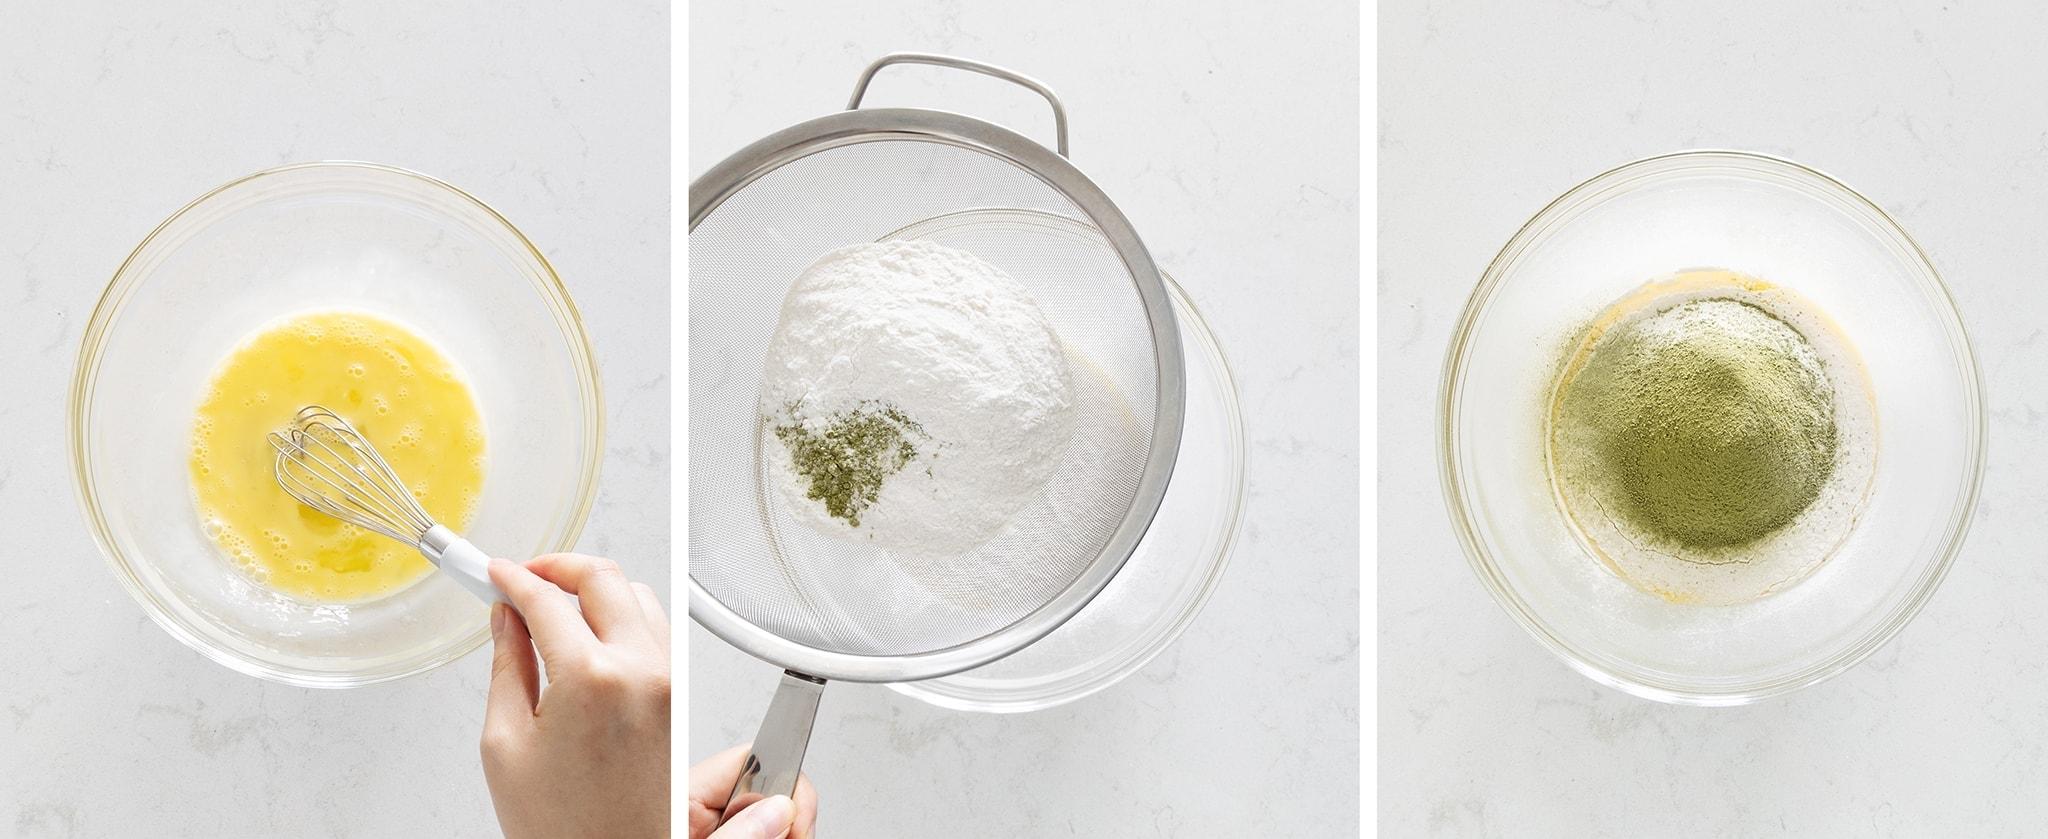 Sifting flour and matcha powder into eggs